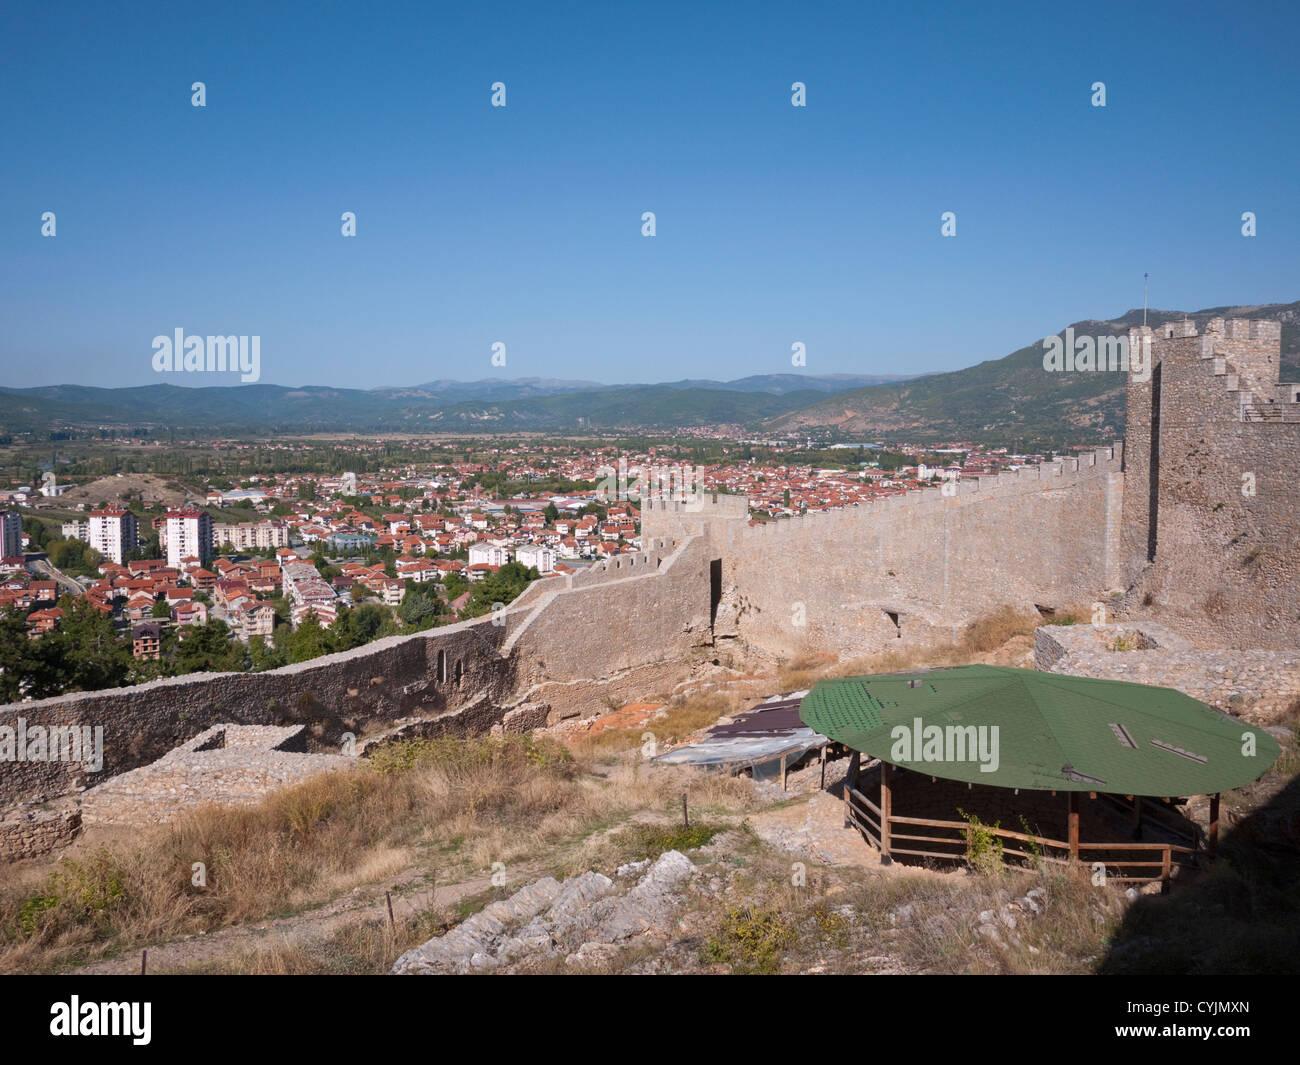 Inside the walls of 10th Century Tsar Samuil's fortress, Ohrid, Republic of Macedonia - Stock Image